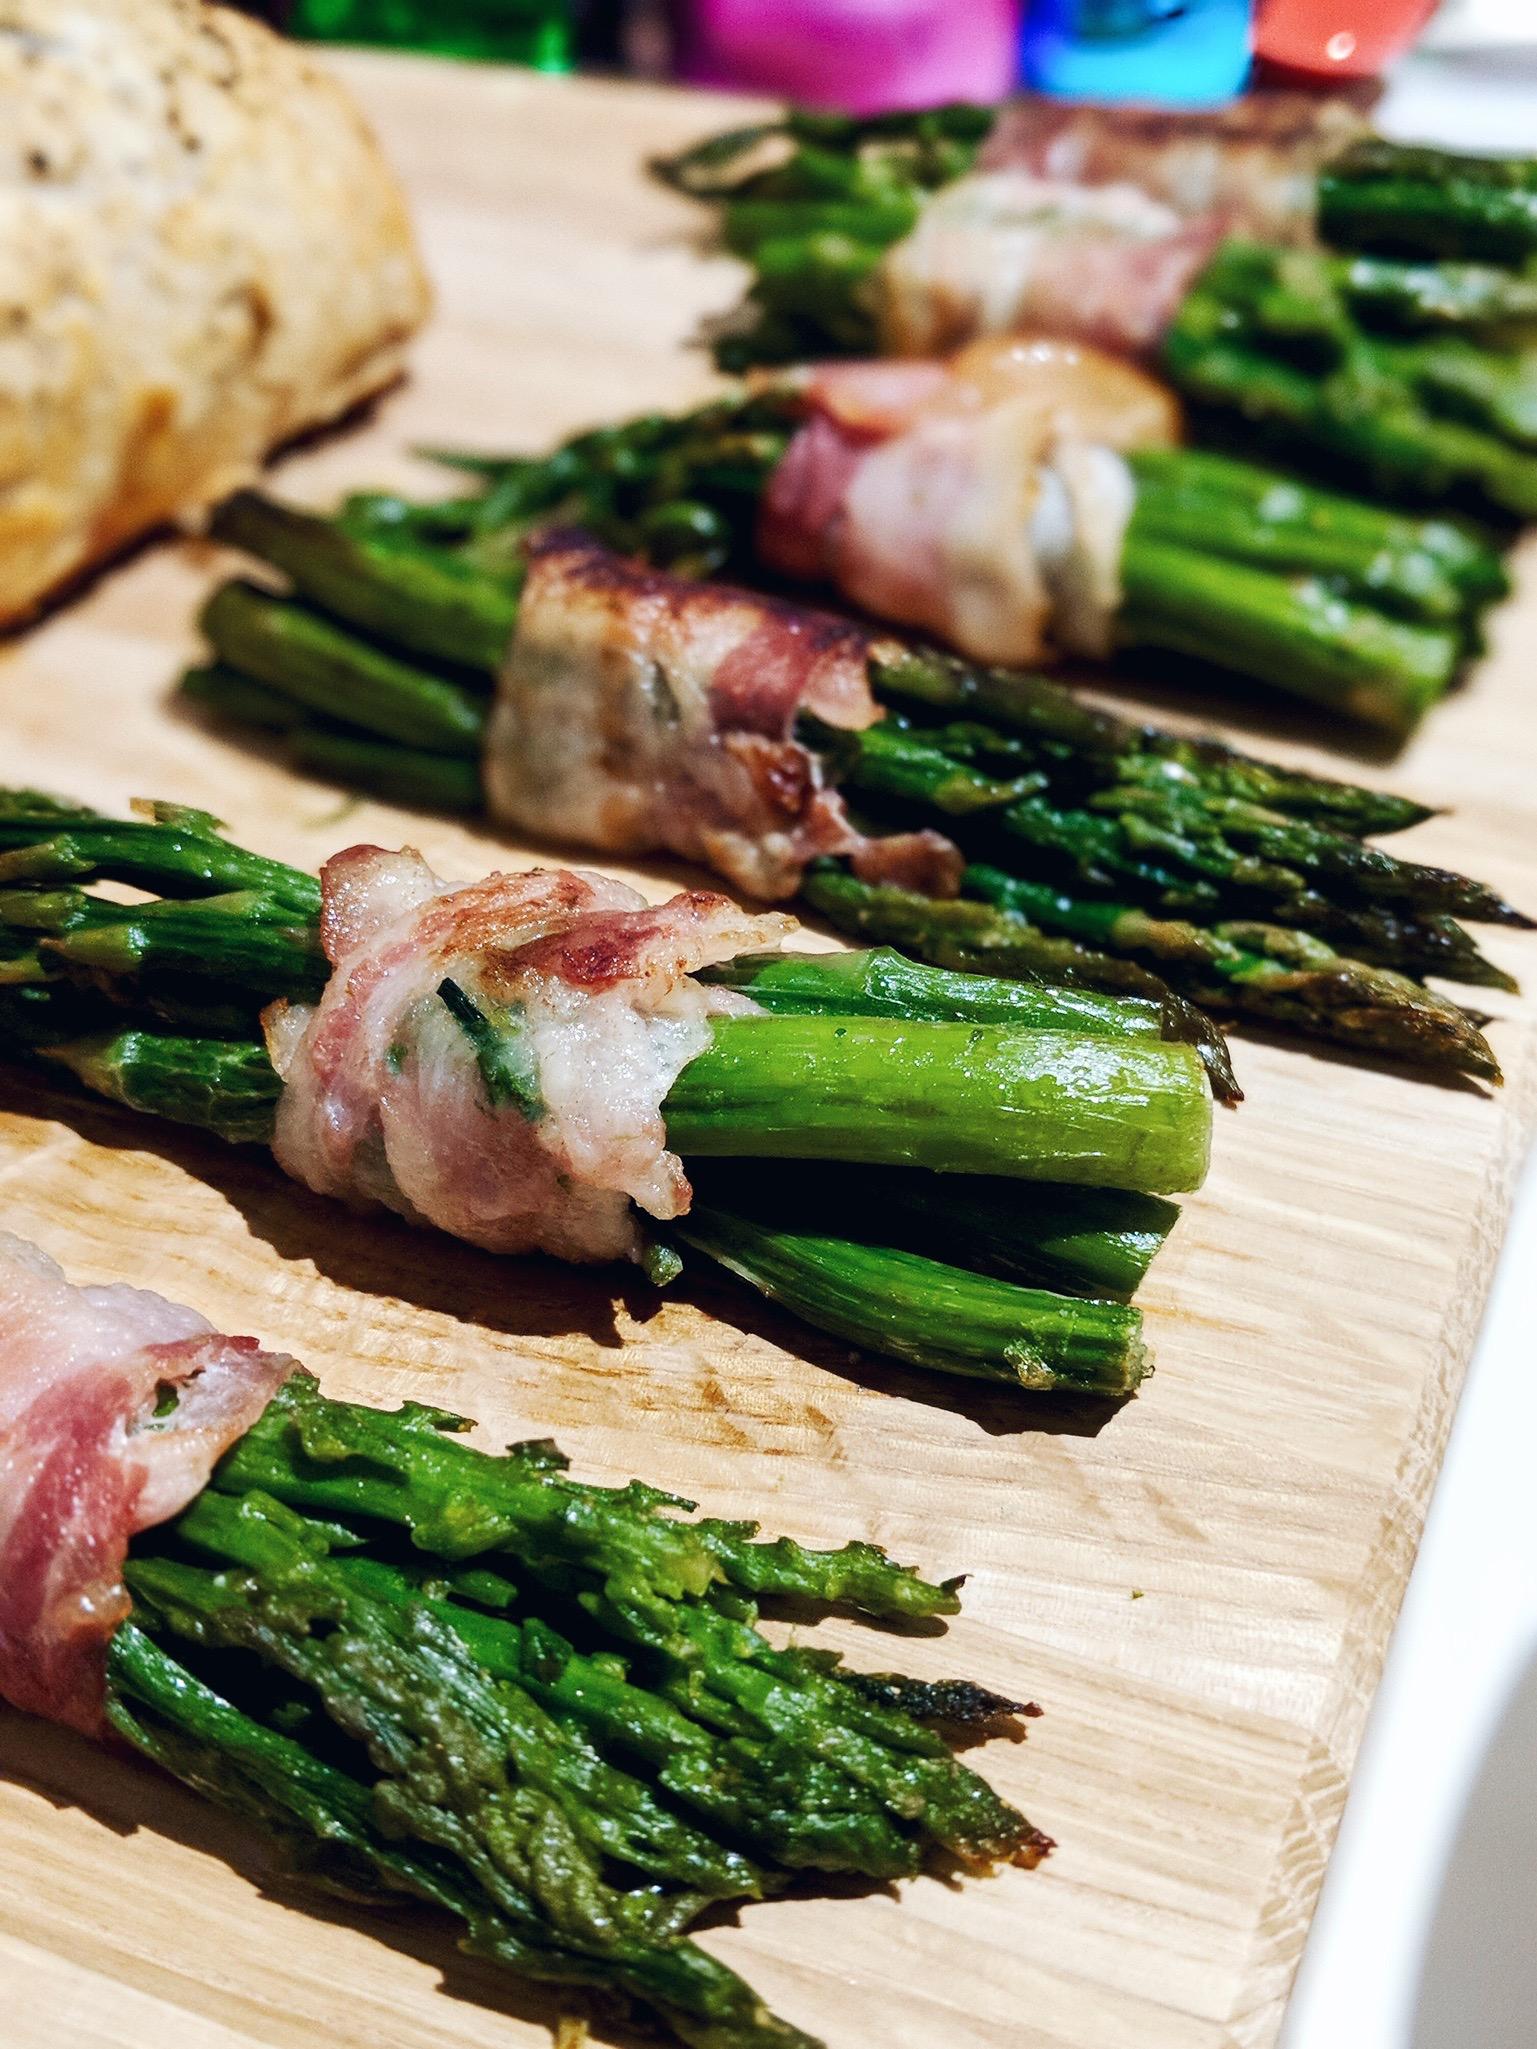 iceland luxury food christmas cocoa chelsea beef wellington asparagus bacon